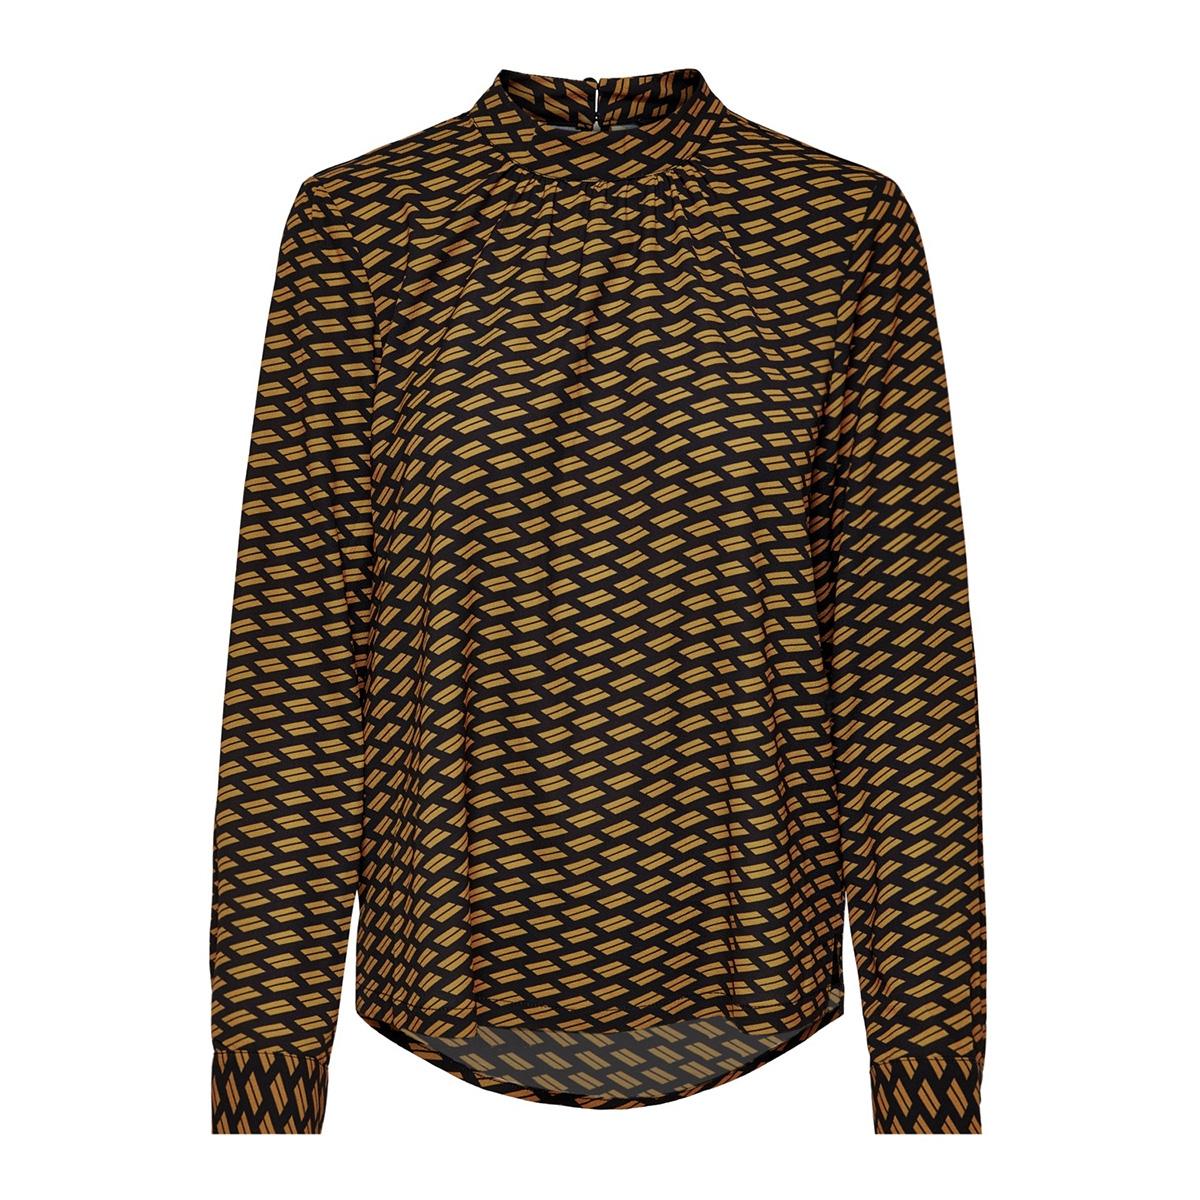 onlnova lux aop l/s  highneck top 8 15191107 only blouse black/graphic earth